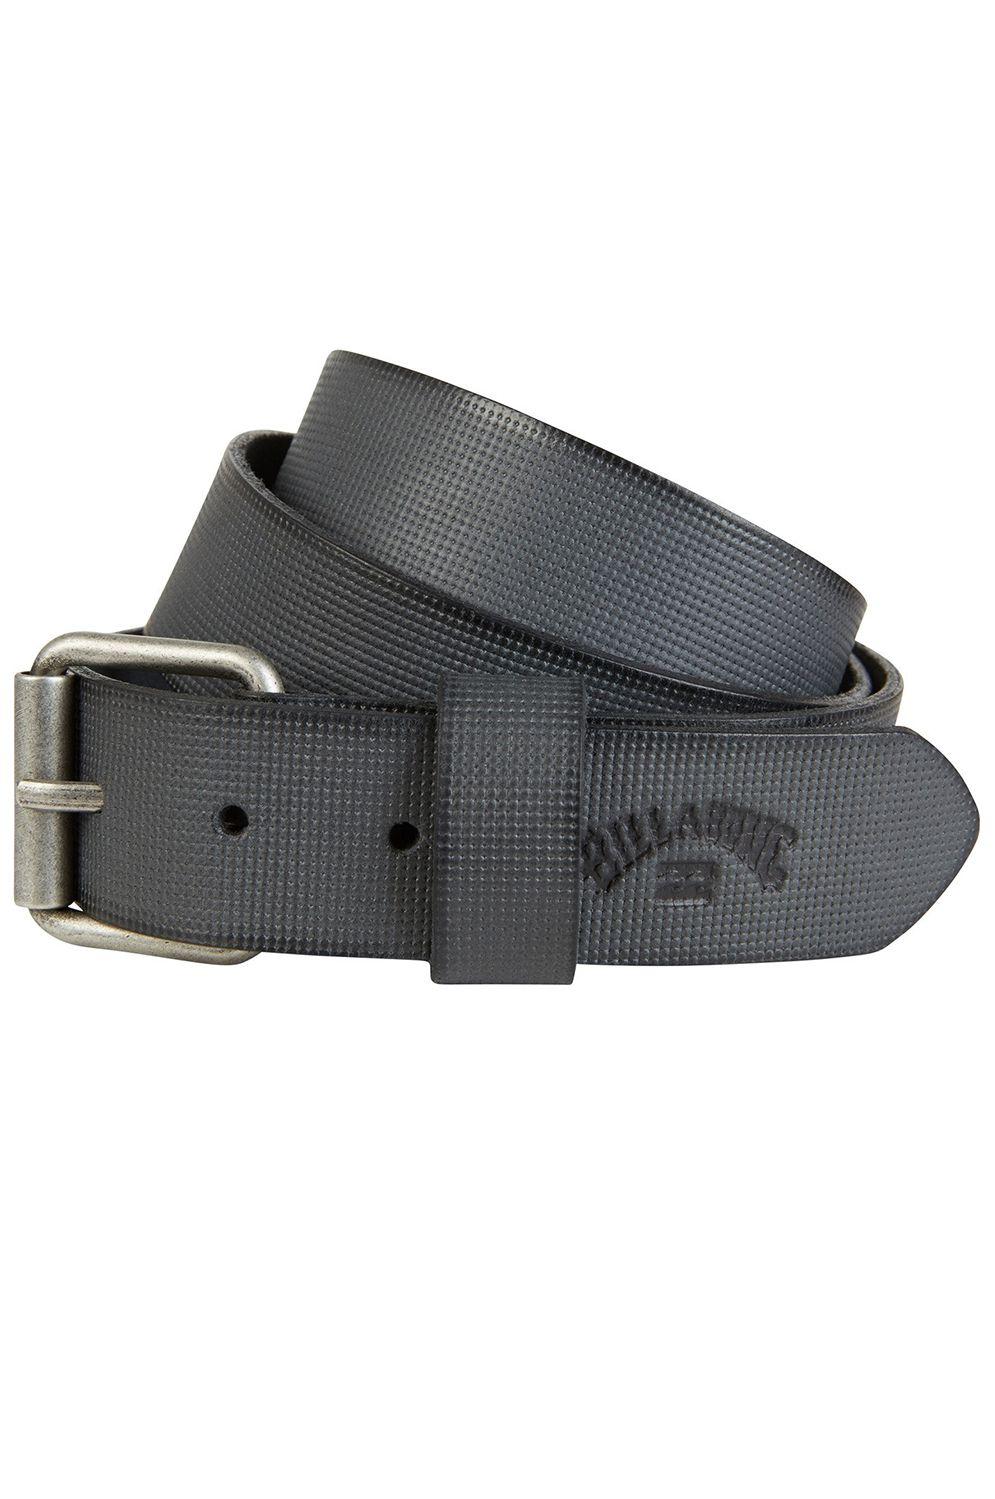 Billabong Leather Belt DAILY Black